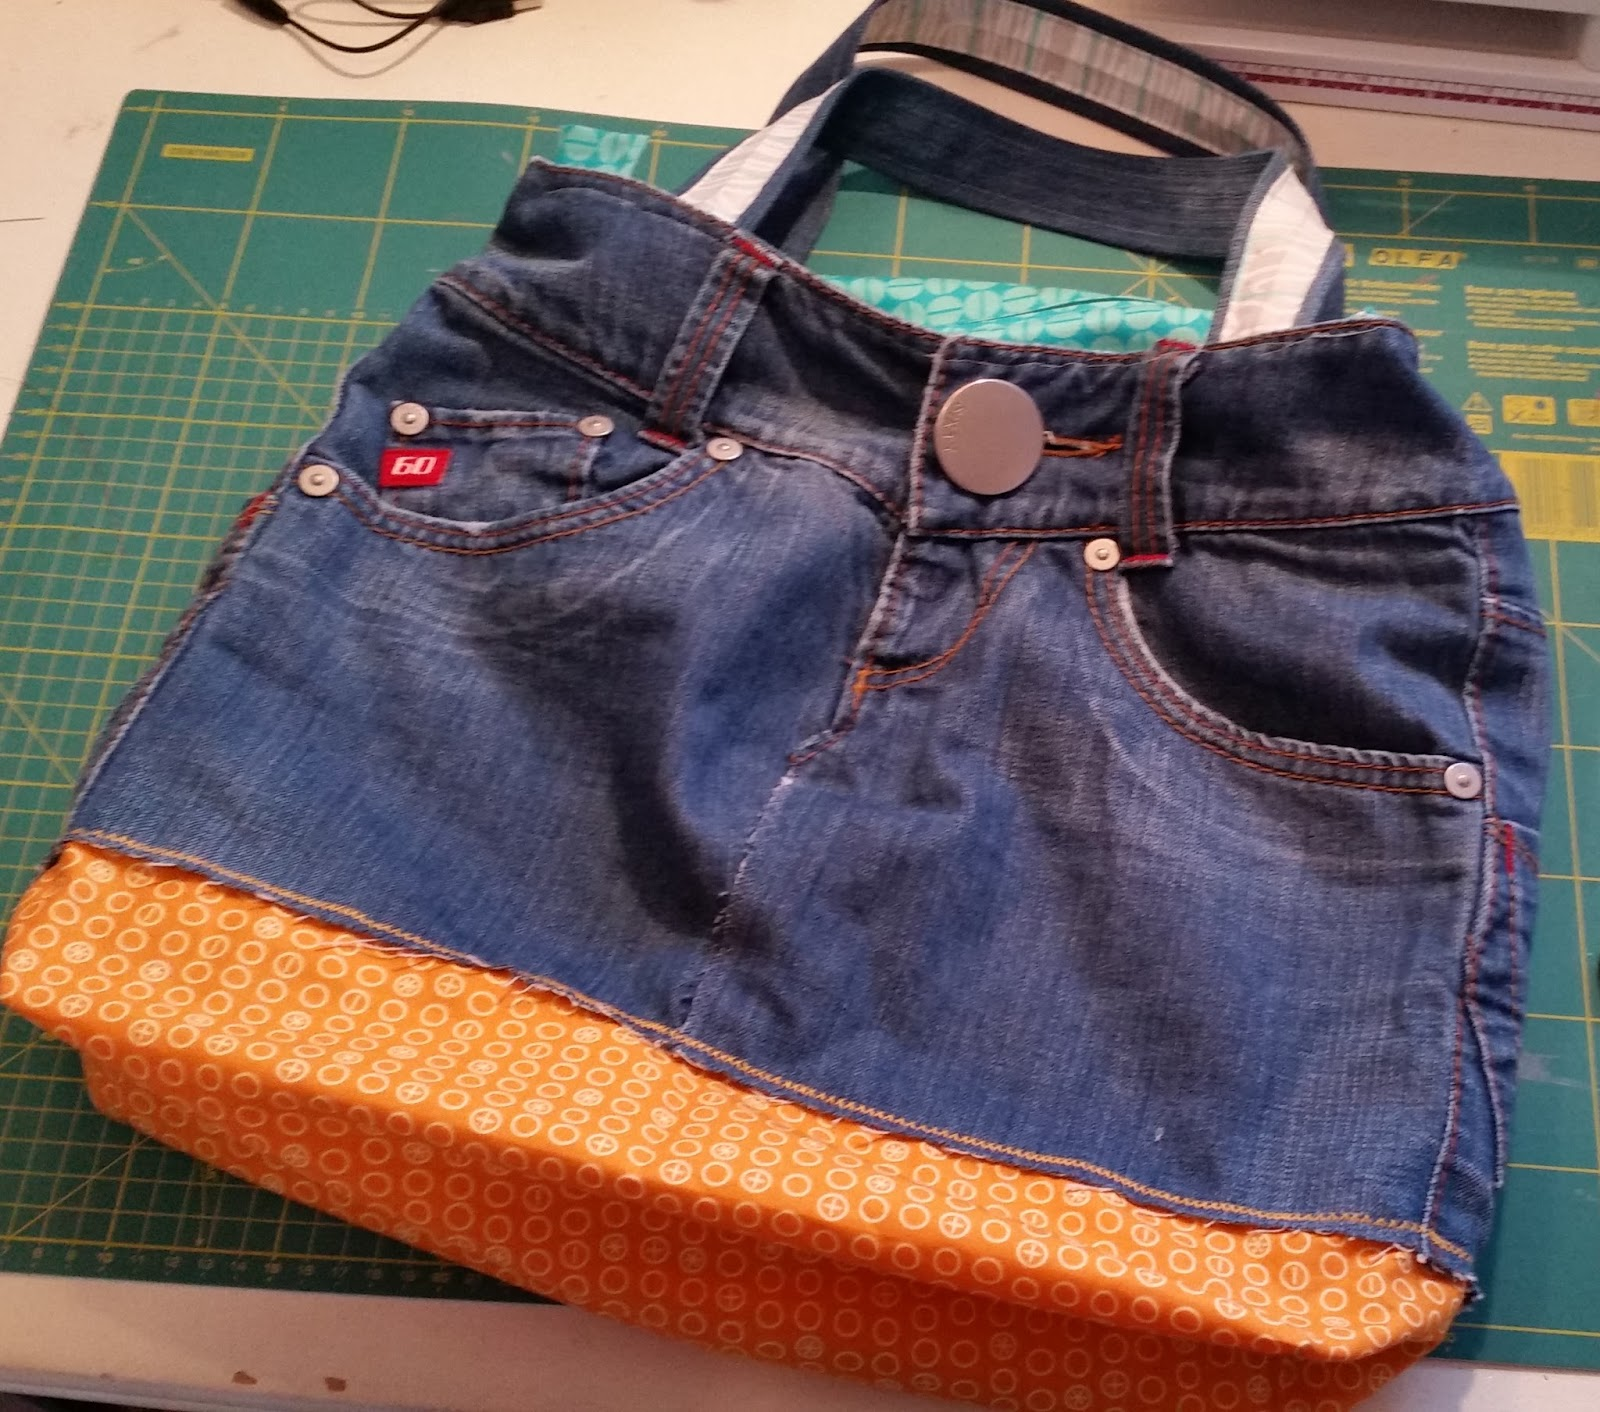 die fabelhafte welt der seifenkunst jeans upcycling eine jeanstasche n hen. Black Bedroom Furniture Sets. Home Design Ideas